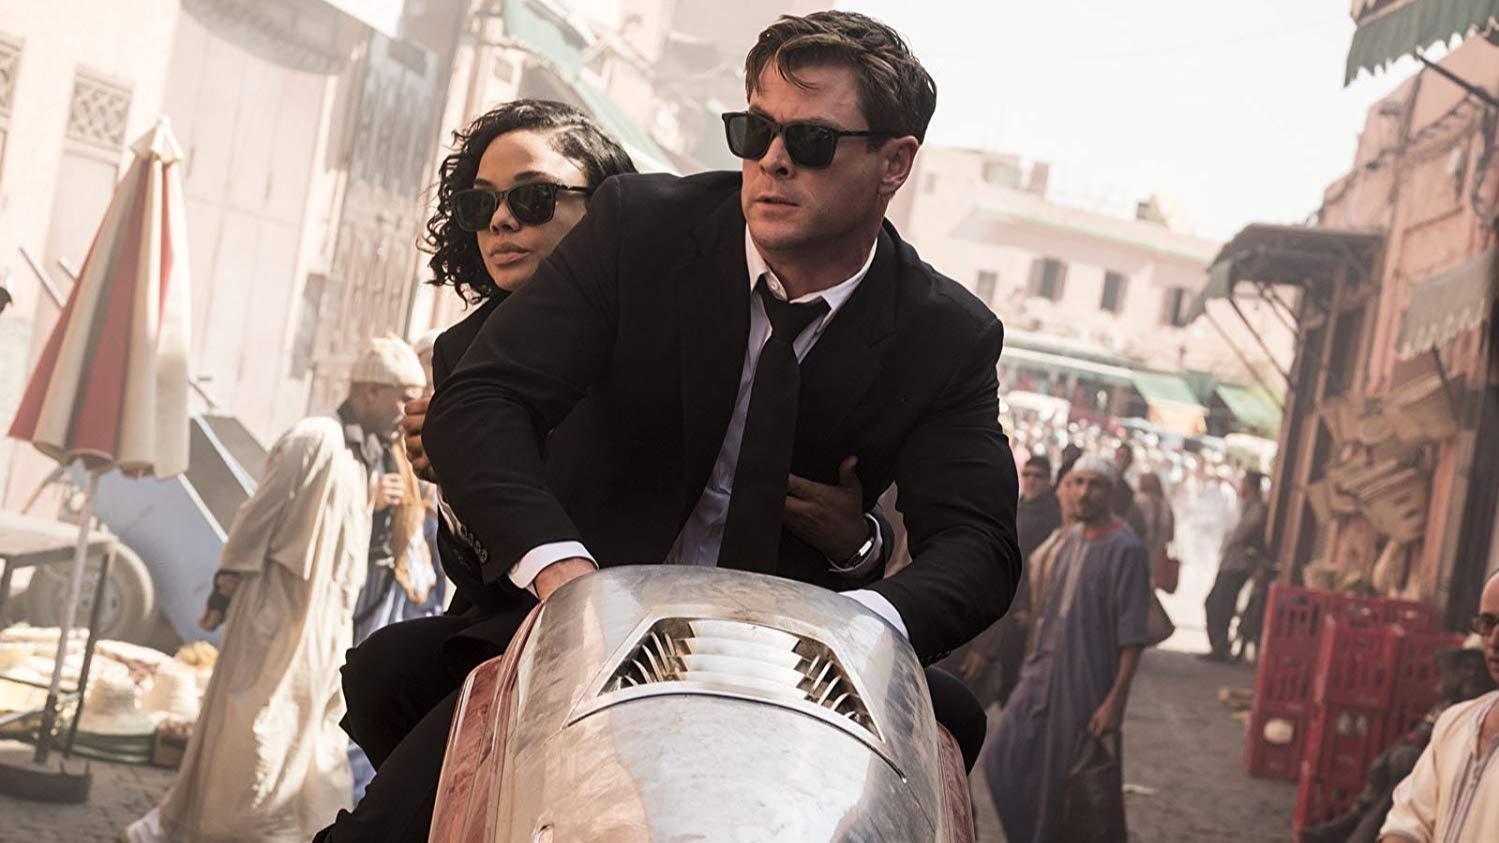 Chris Hemsworth, Tessa Thompson, Men in Black International, Liam Neeson, Emma Thompson, F Gary Gray, Kumail Nanjiani,